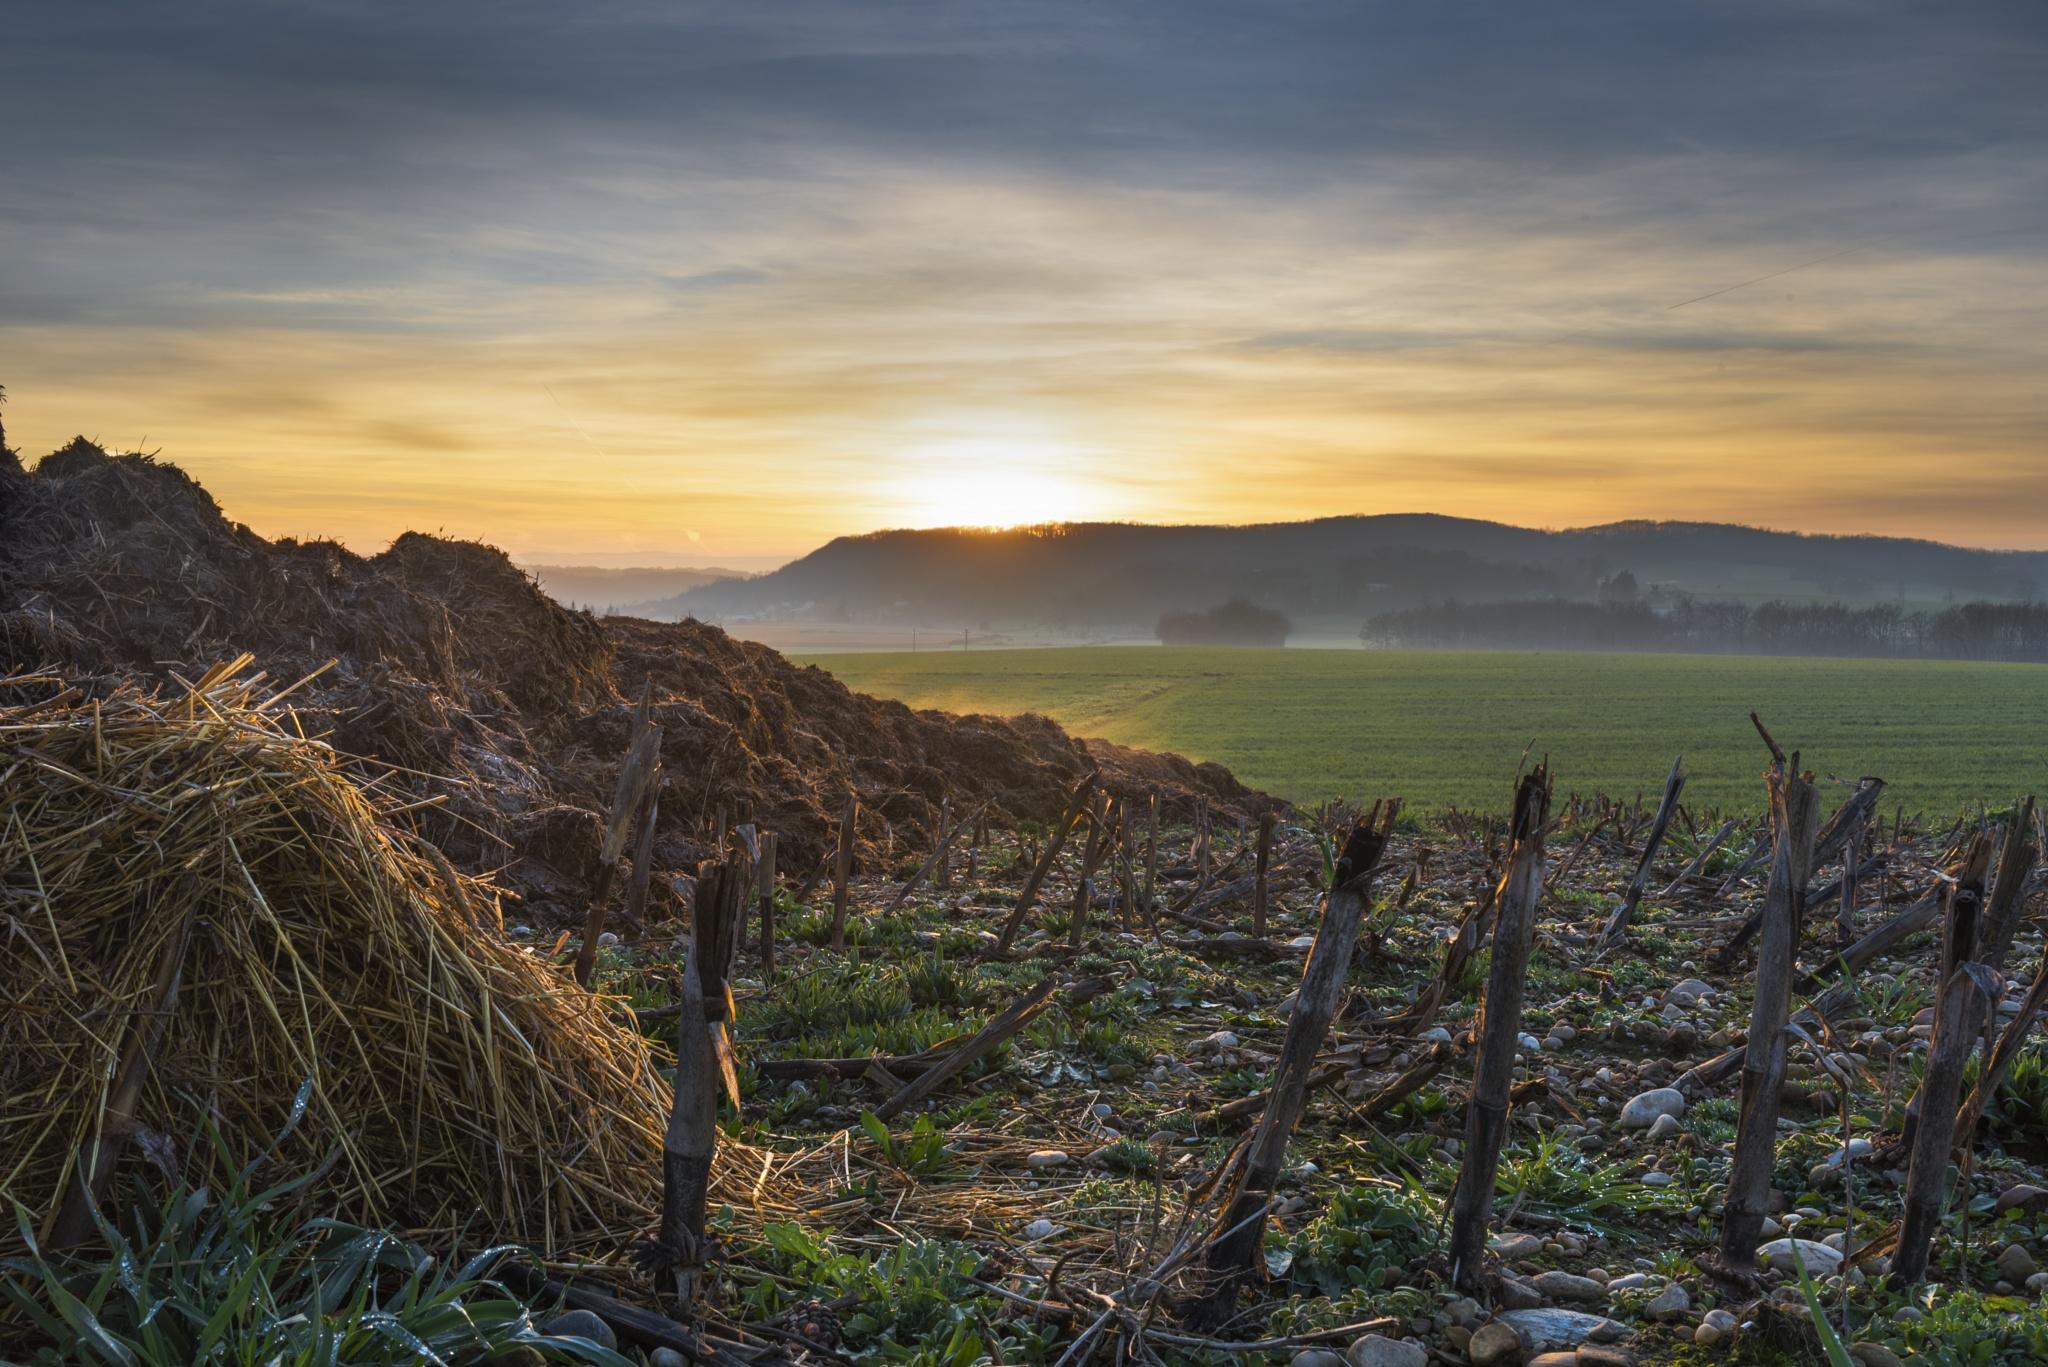 sunset dri by AnthonyVairos